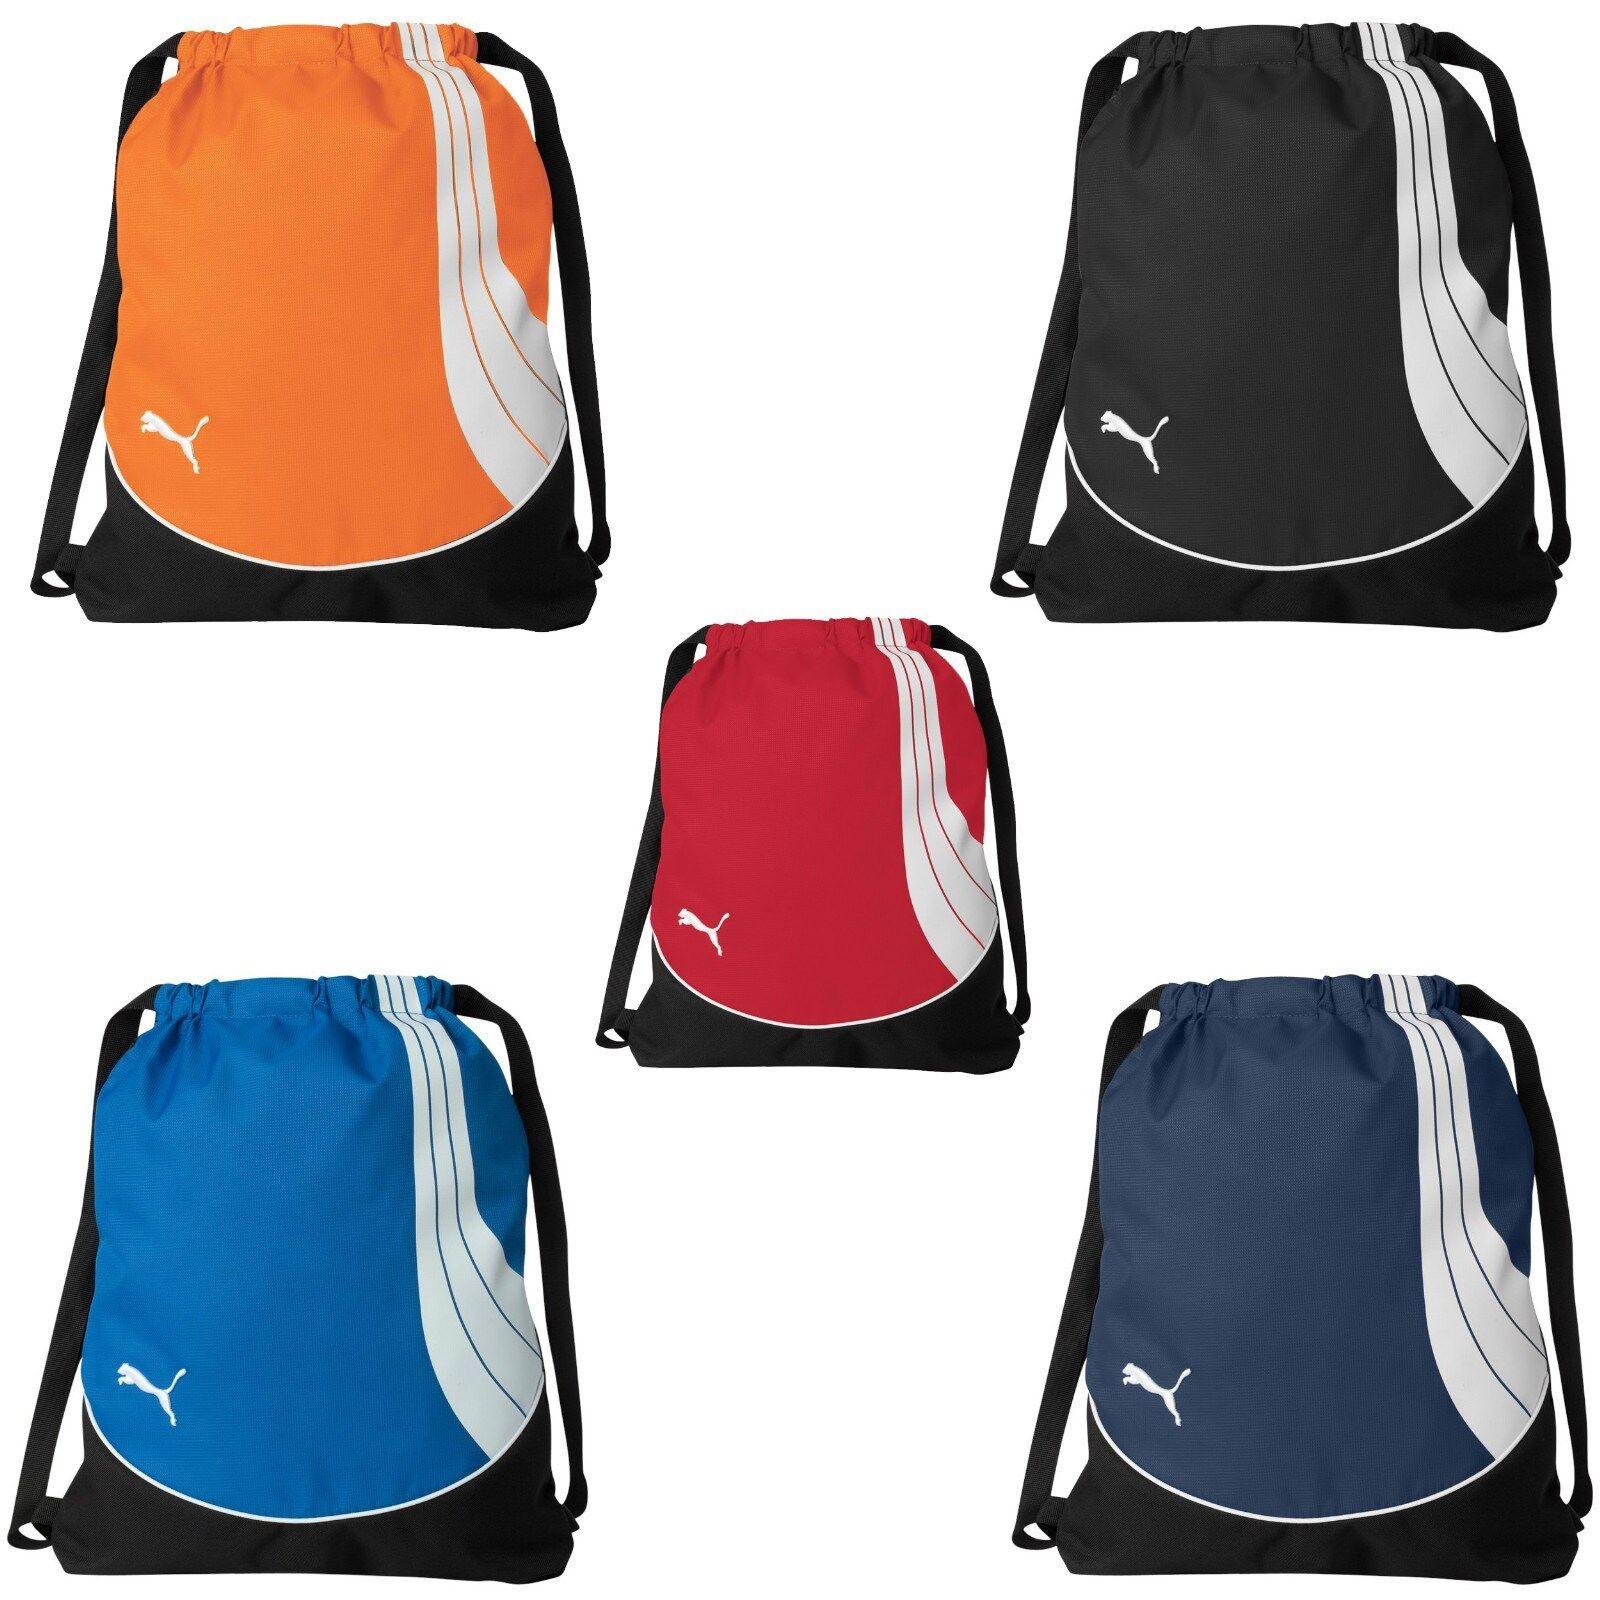 Dolphin Art Drawstring Backpack Rucksack Shoulder Bags Training Gym Sack For Man And Women